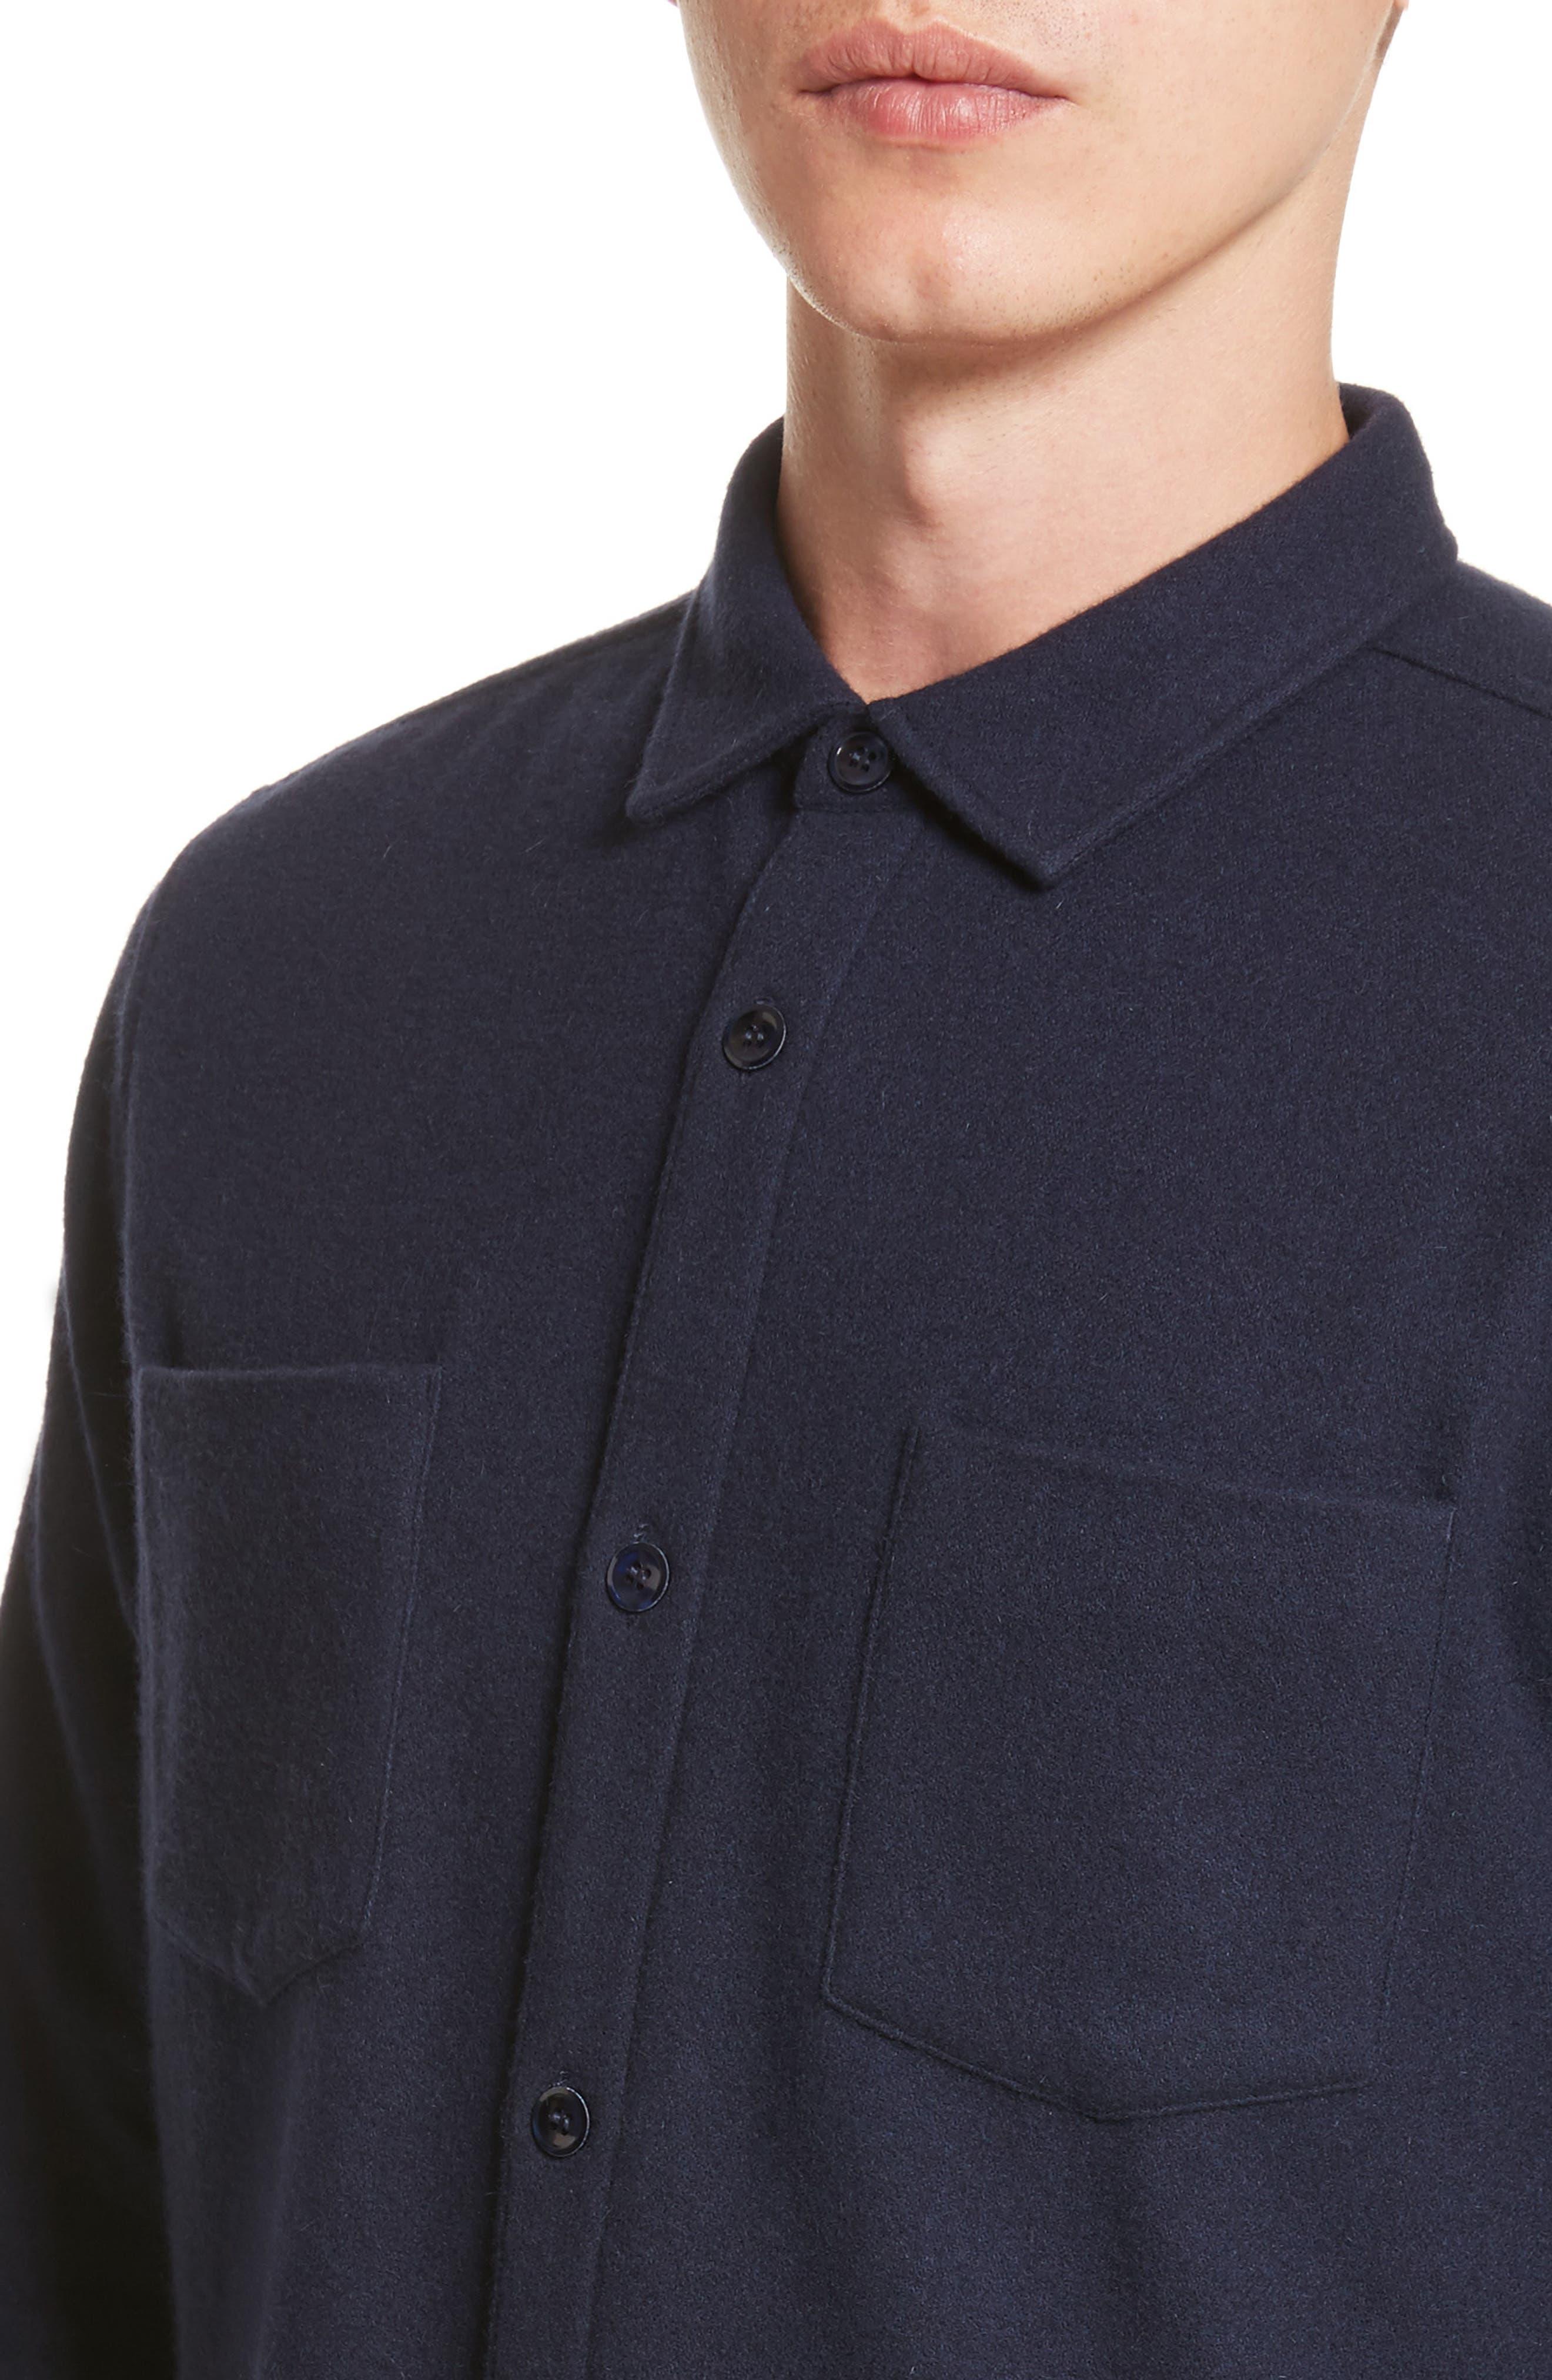 Fritz Wool Blend Shirt Jacket,                             Alternate thumbnail 4, color,                             410